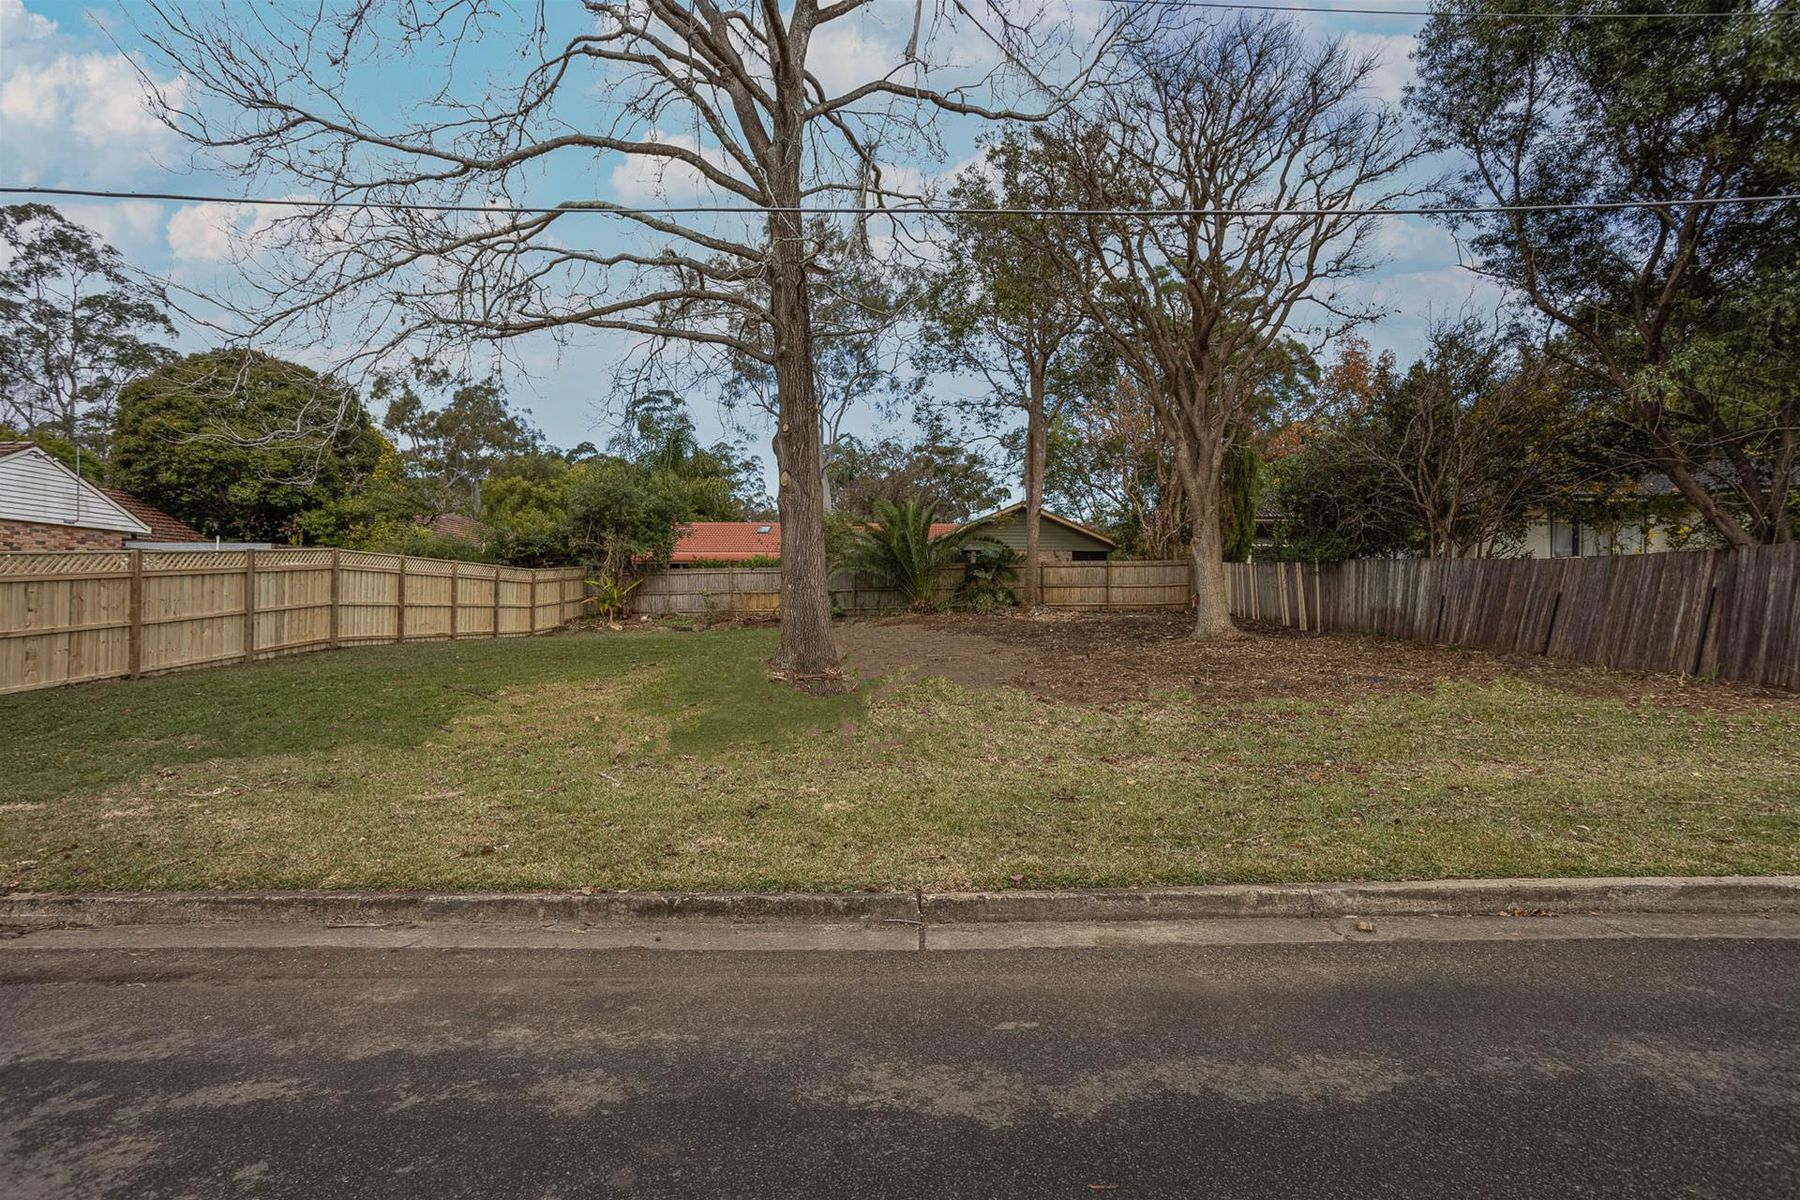 1A Jadchalm Street, West Pennant Hills, NSW 2125